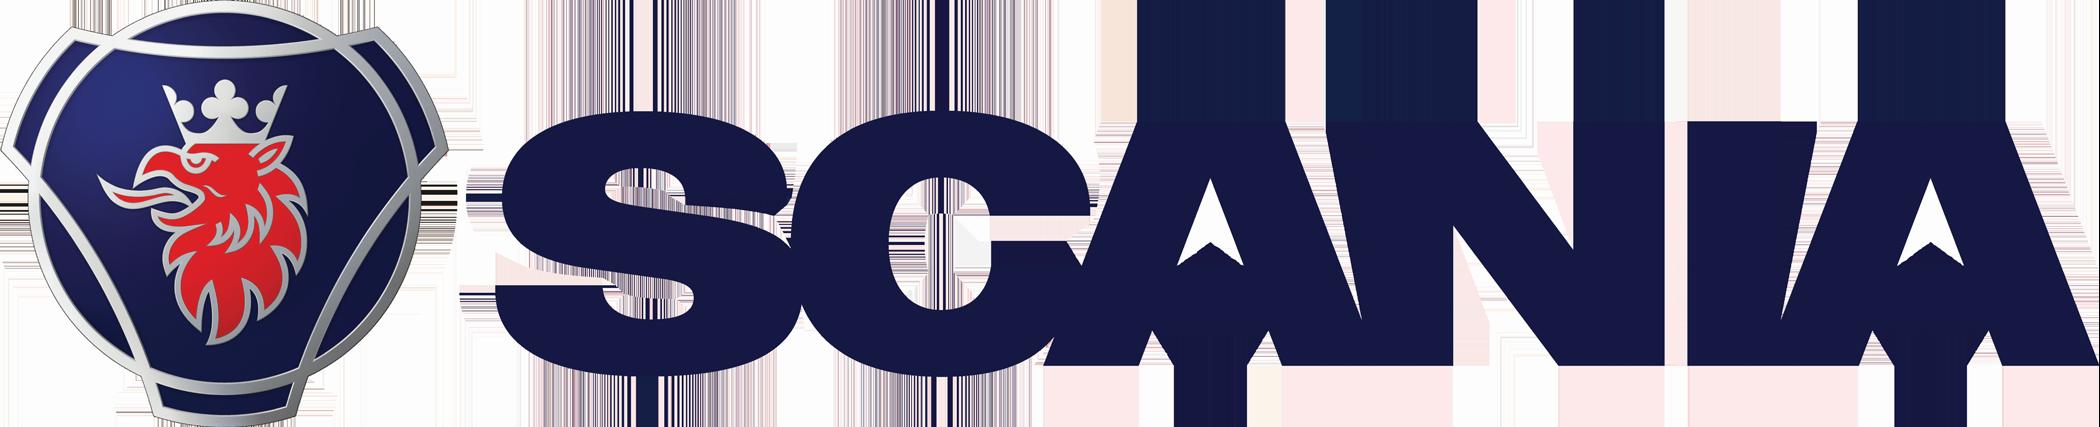 Scania Logo PNG - 112122